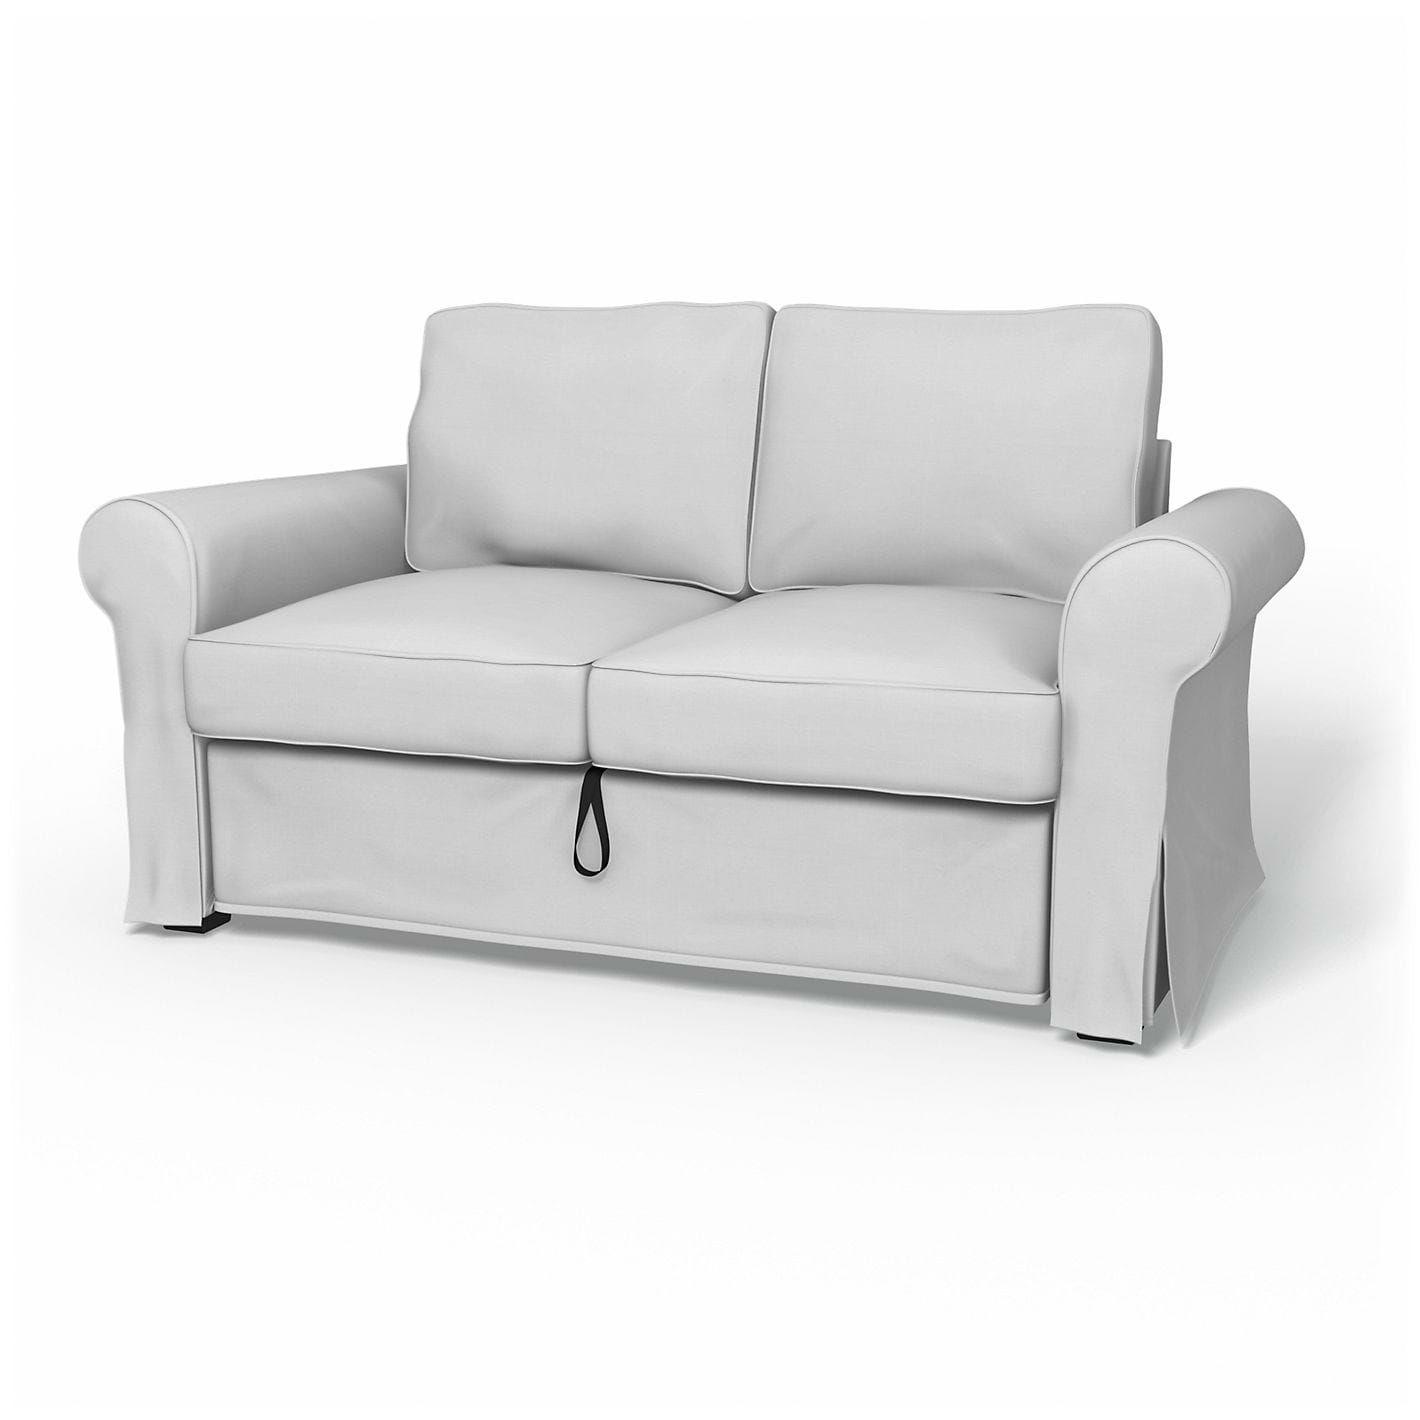 Armchair Sofa Bed Australia In 2020 Sofa Bed Australia Ikea Sofa Bed Ikea Sofa Covers